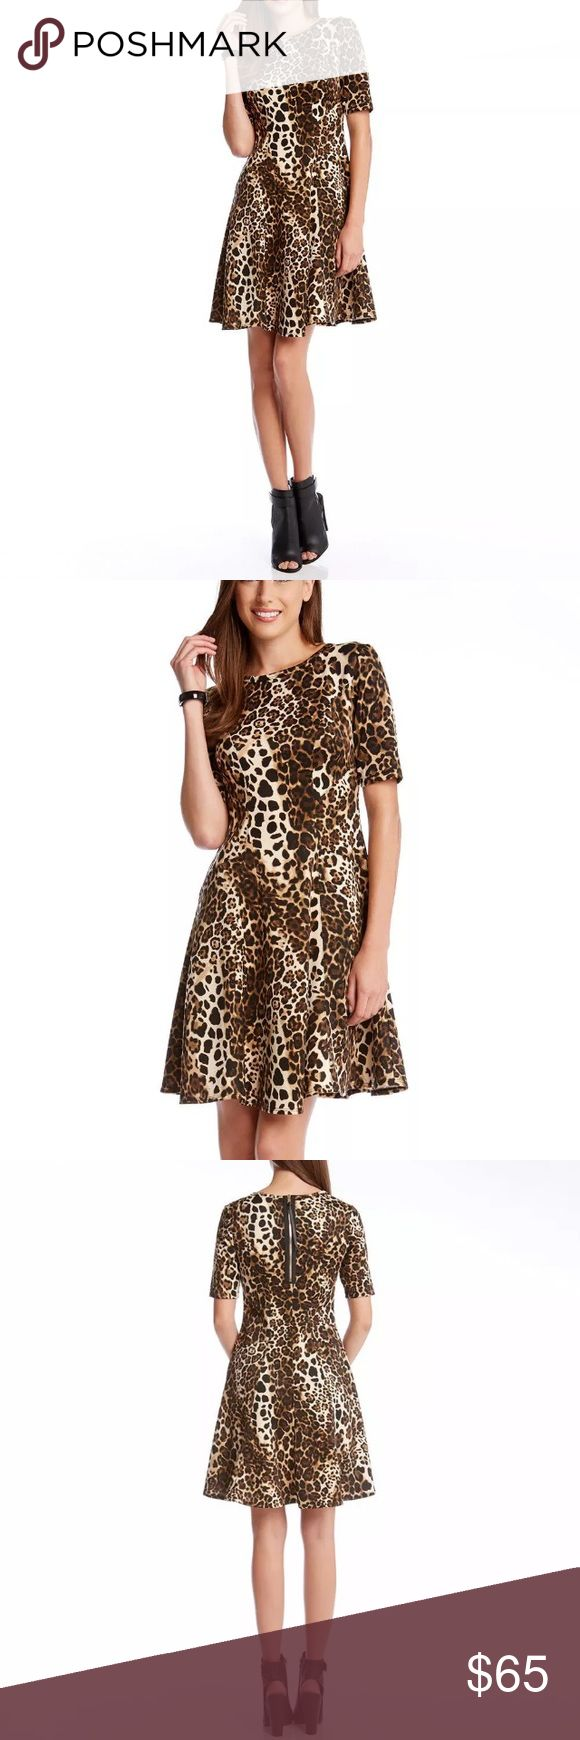 Karen Kane Scuba Fit & Flare Cheetah Dress NWOT Cheetah Print Half Sleeve XL Karen Kane Dresses Midi